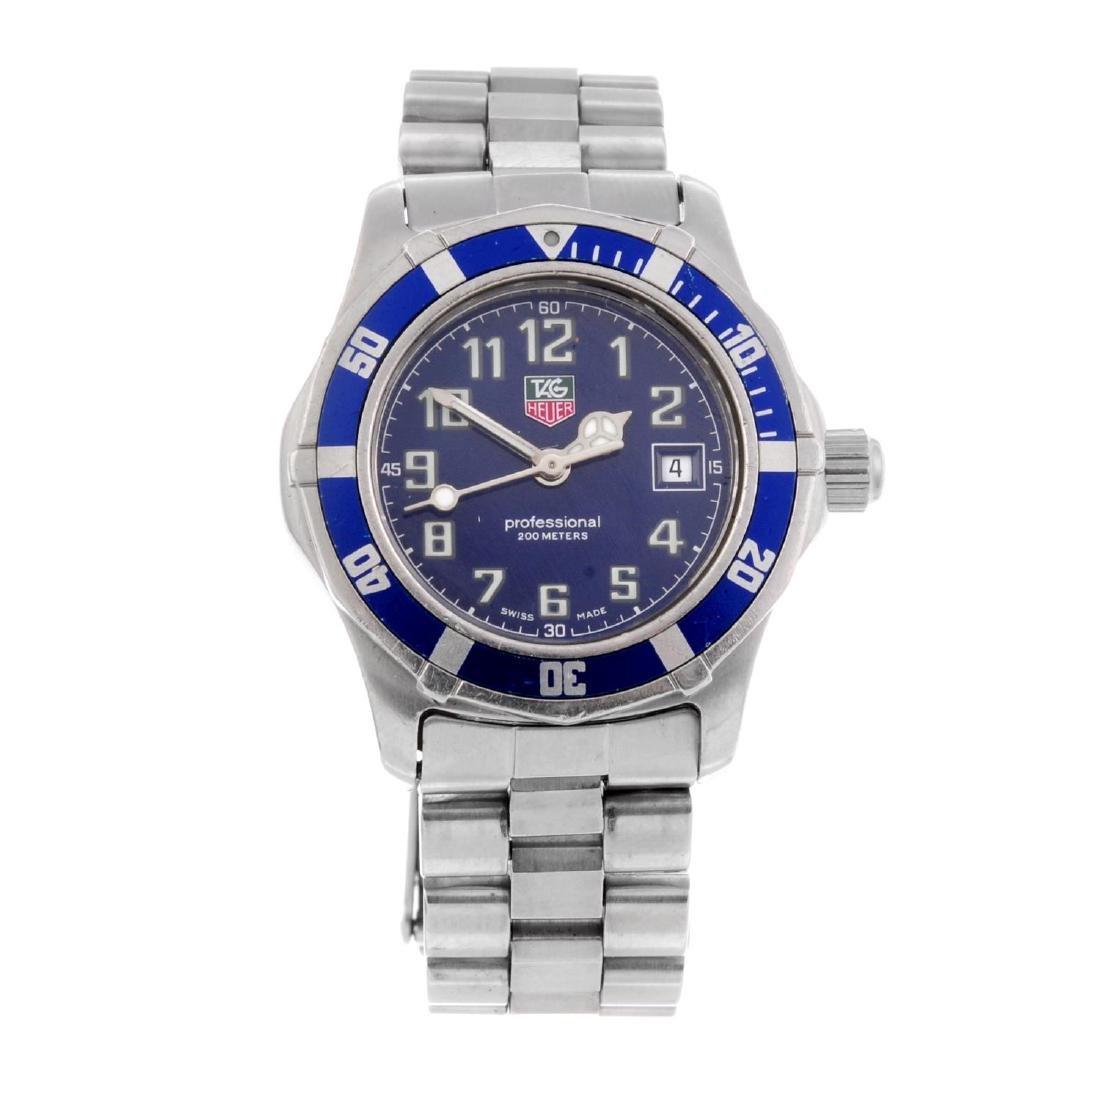 TAG HEUER - a lady's 2000 Sport series bracelet watch.